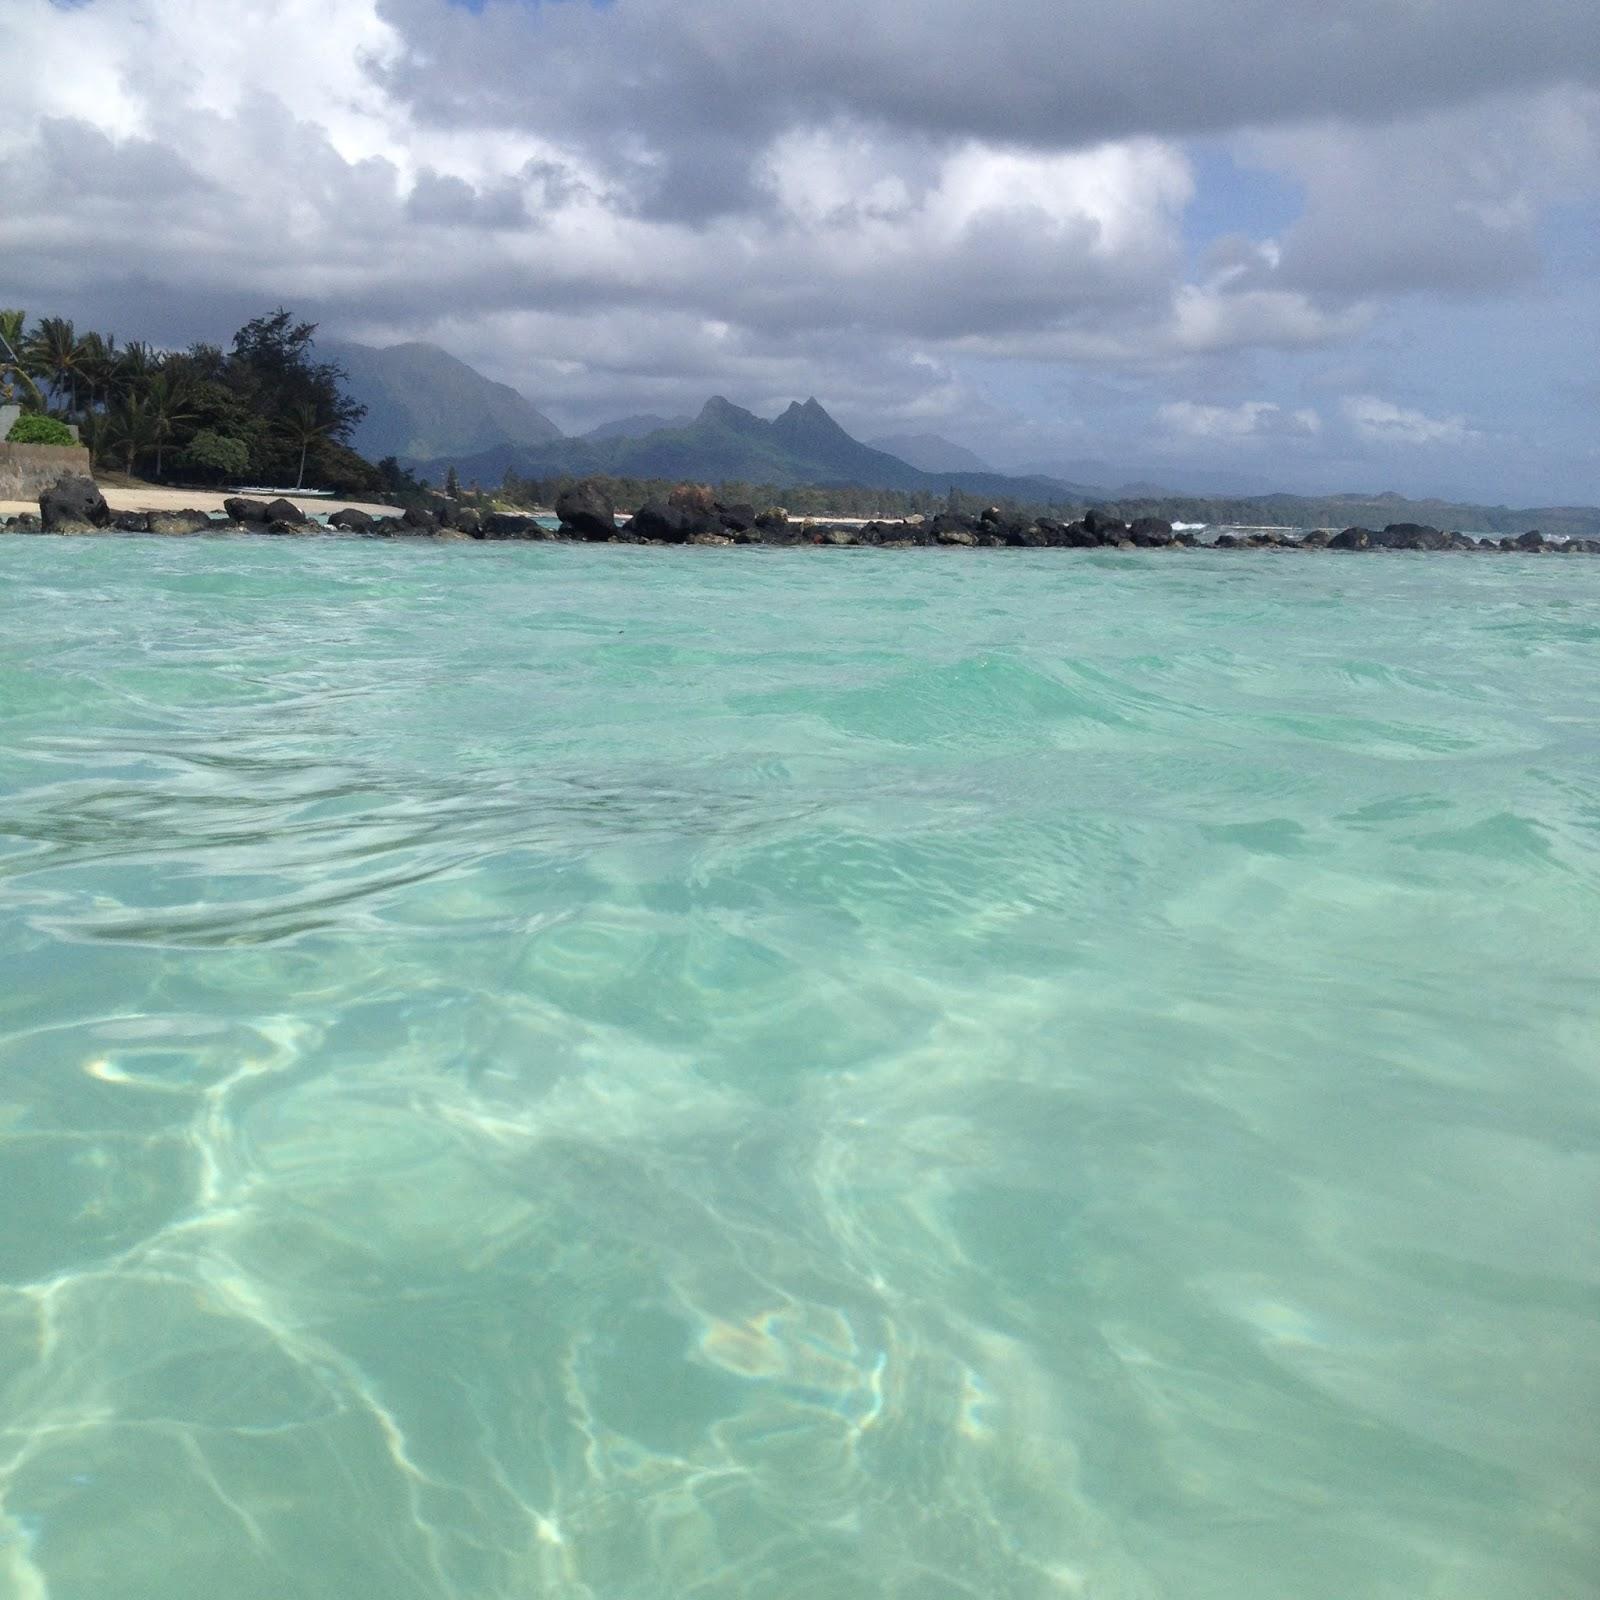 Beach House In Oahu: The Project Spot: Aloha-My Top Oahu Vacay Tips